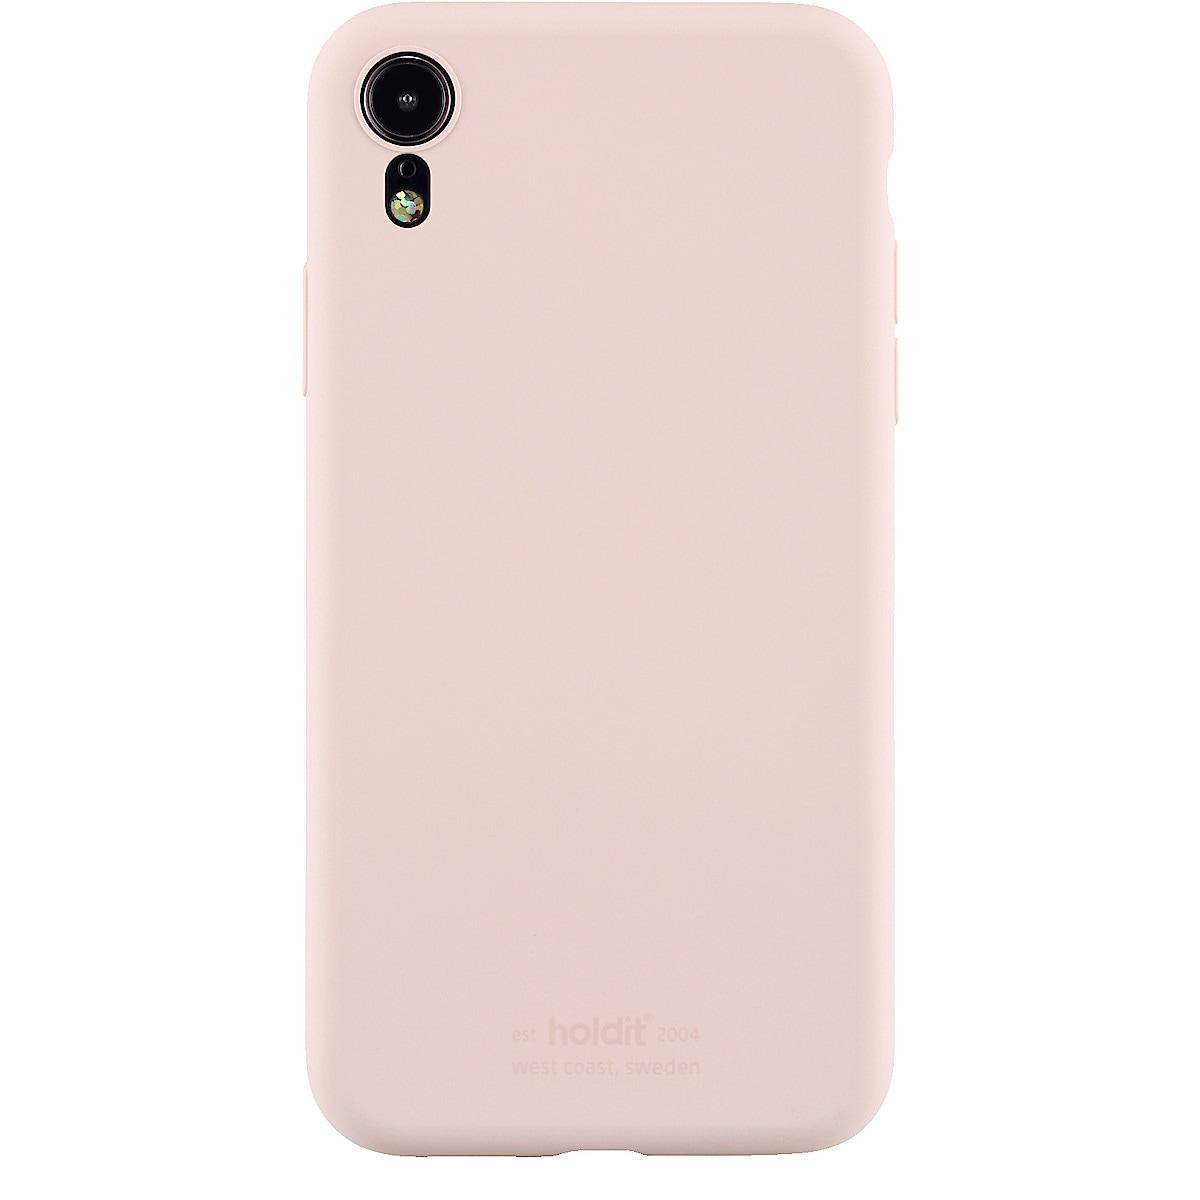 Mobilskal i silikon för iPhone XR Holdit